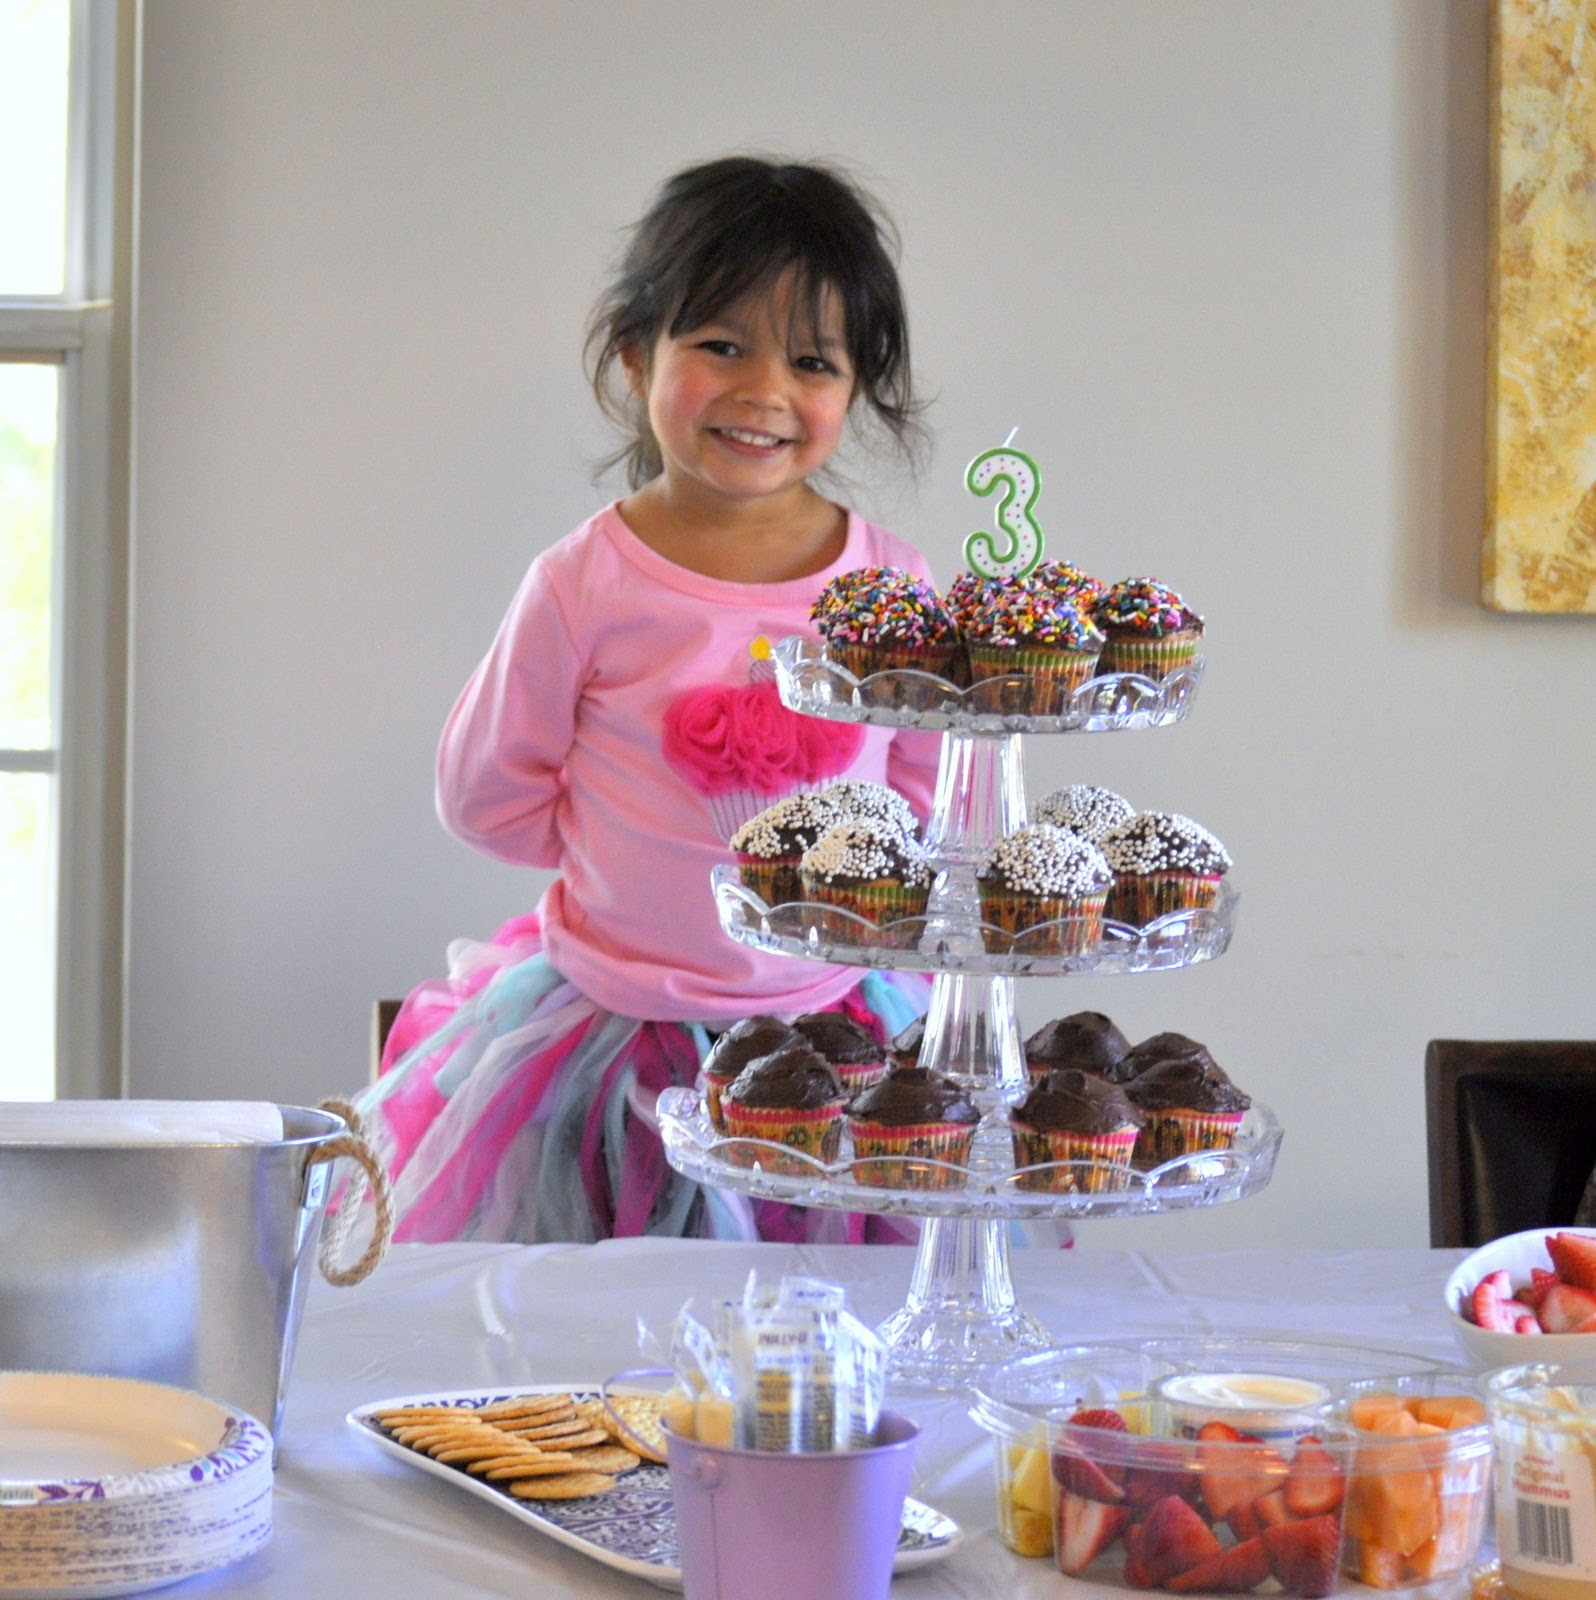 Cupcakes-for-Third-Birthday-tasteasyougo.com